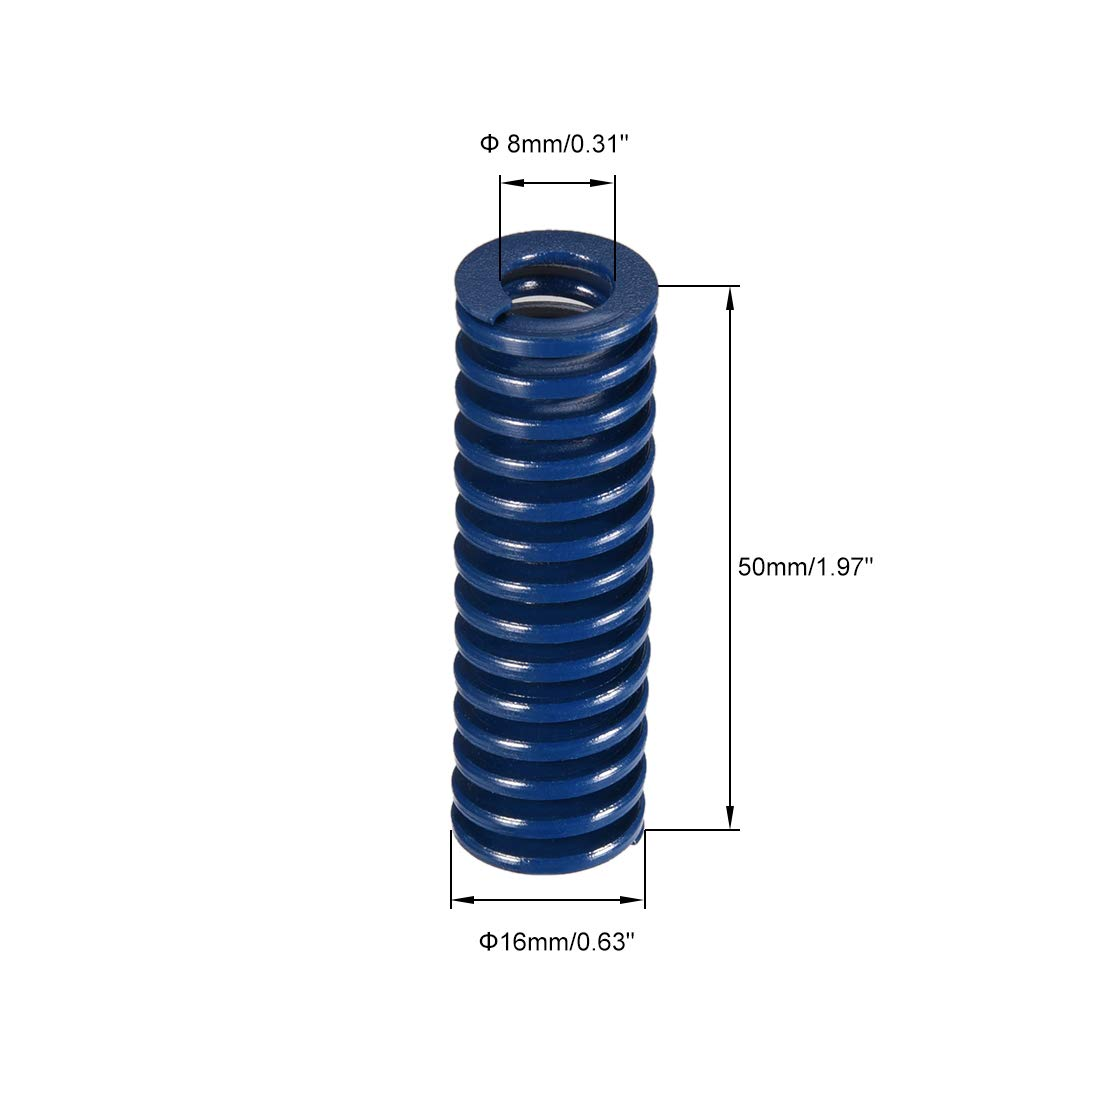 sourcing map 16x50mm largo espiral estampado carga ligera molde de compresi/ón resorte rectangular azul 10 unids